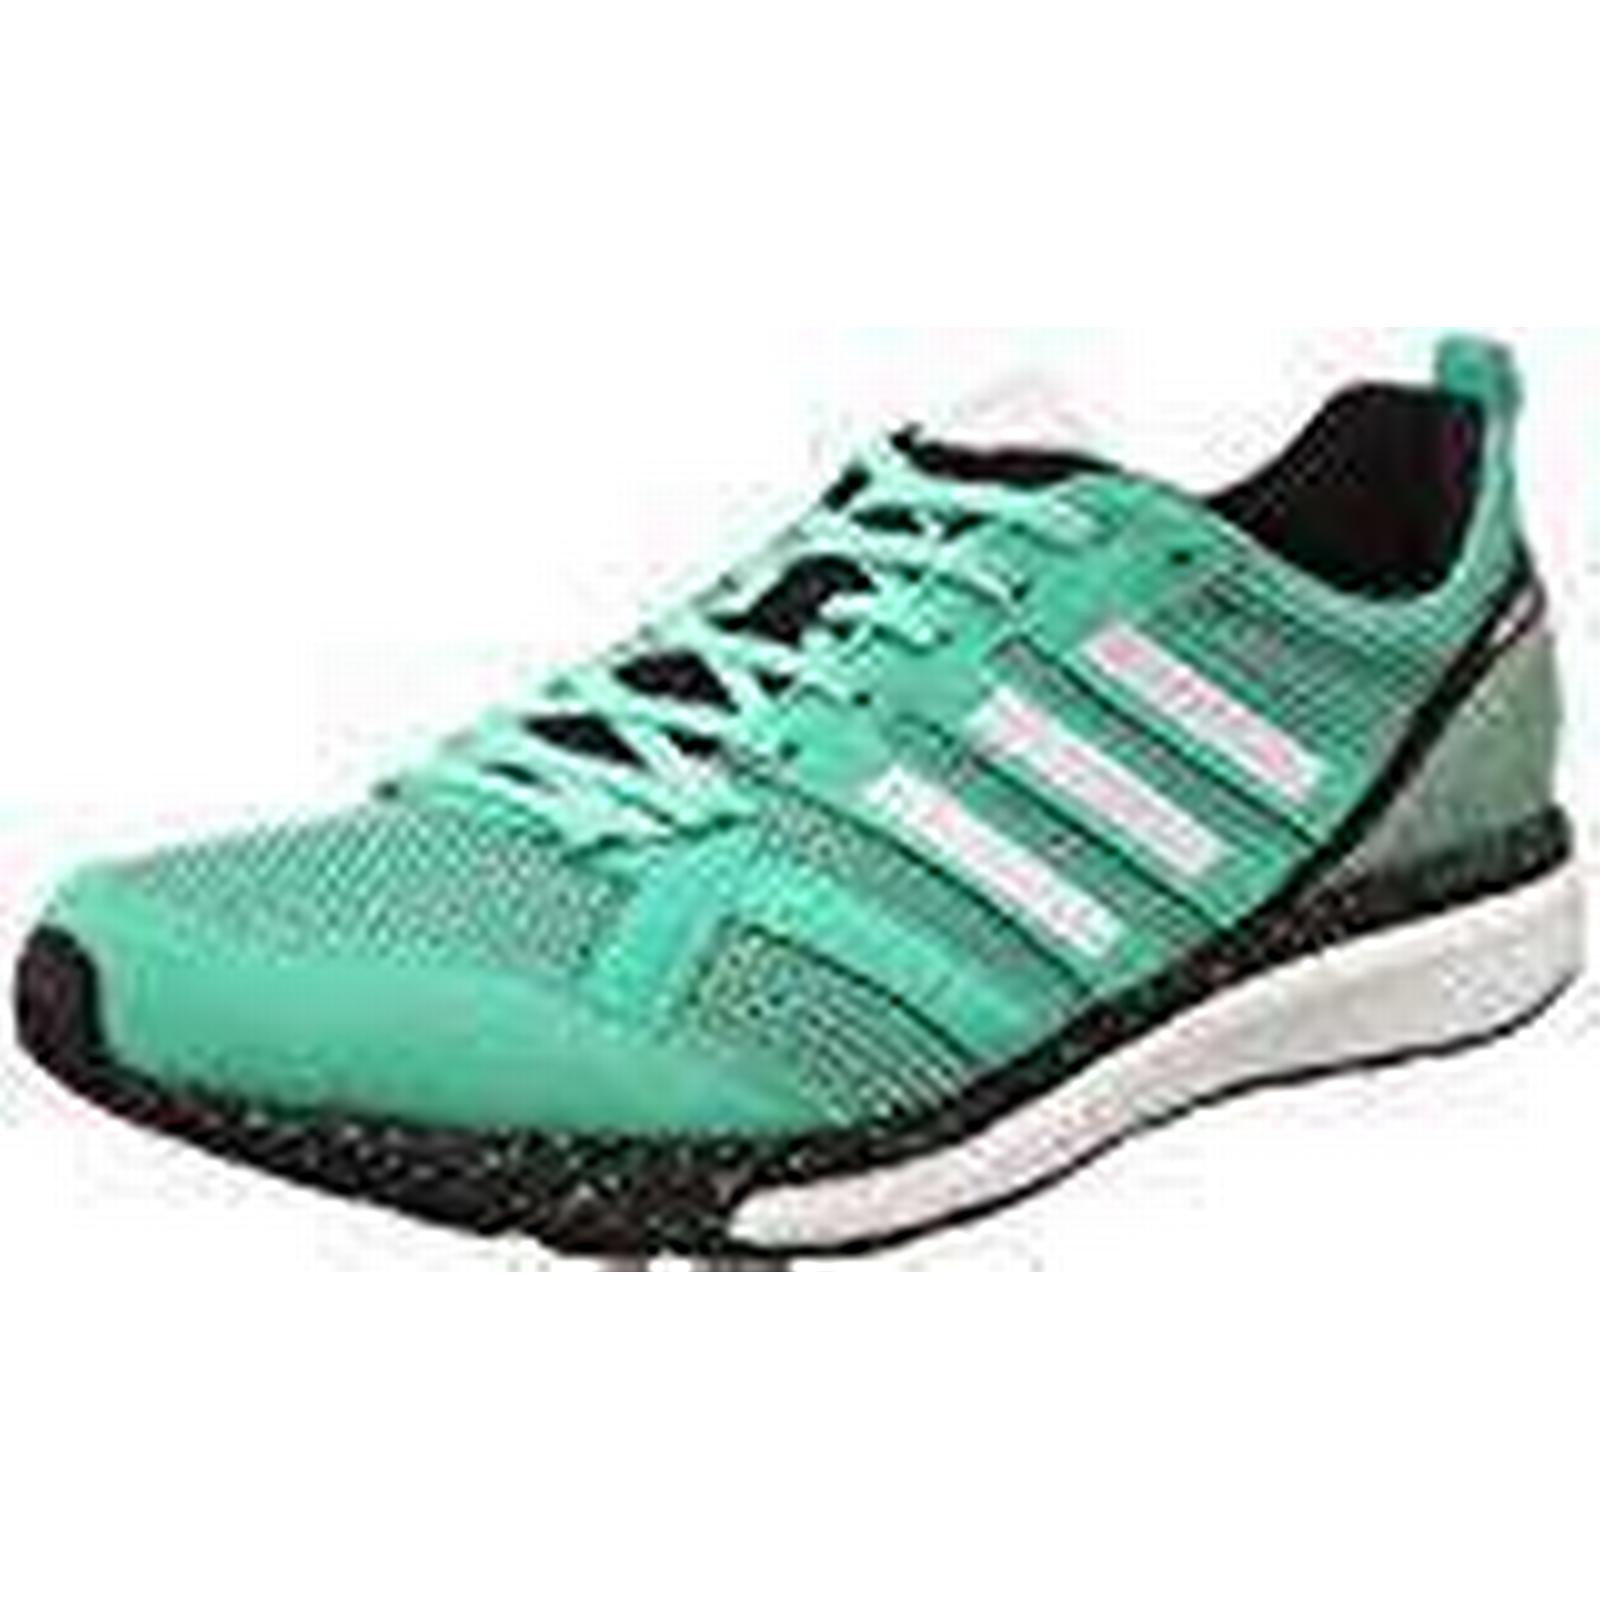 Adidas Men''s Adizero Tempo 9 (Bgreen/Ftwwht/Hiregr), Competition Running Shoes, Green (Bgreen/Ftwwht/Hiregr), 9 10 UK 344d6a